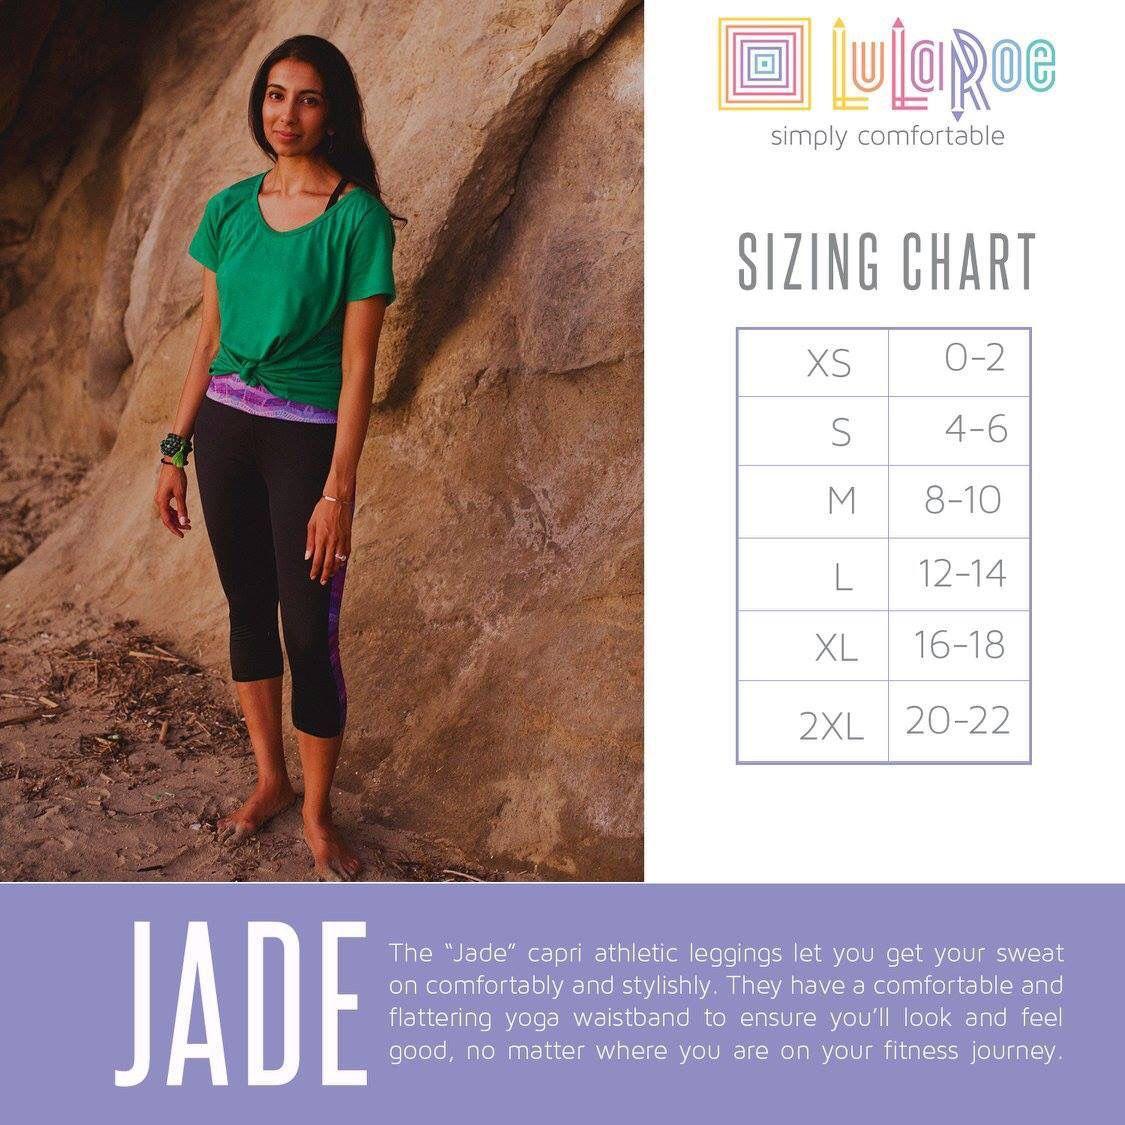 6e8e1daac5f63d Pin by Jill Domme © on Plunder Biz Ideas | Lularoe jade sizing ...